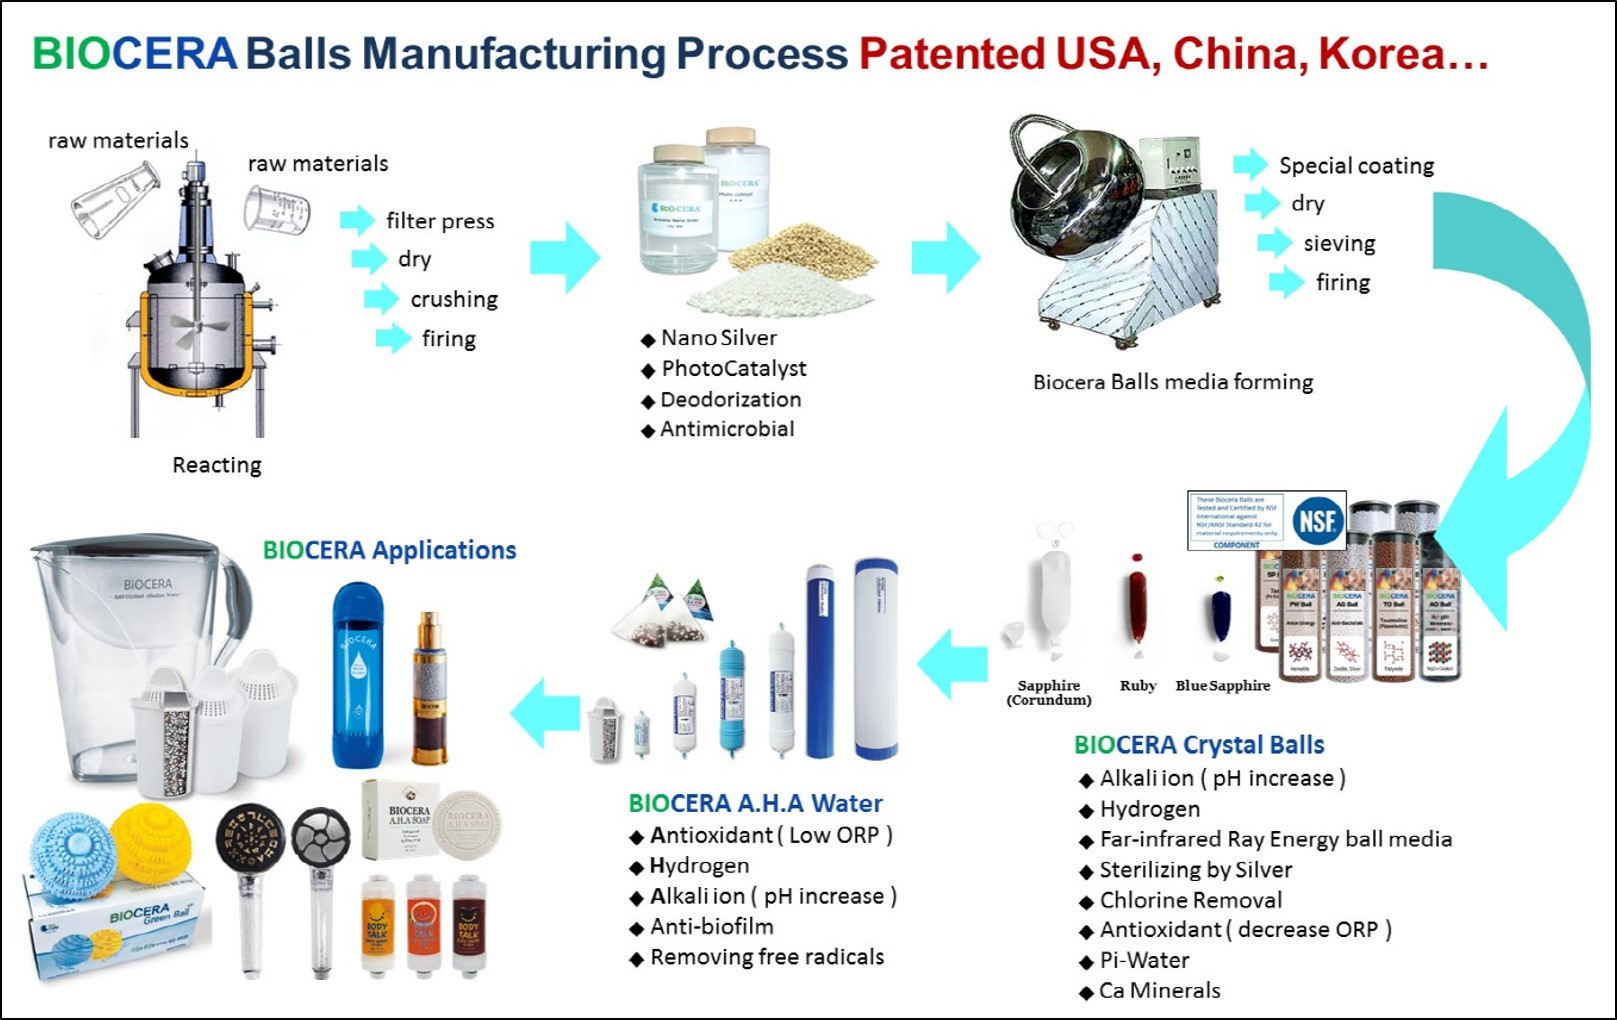 Biocera ceramic balls manufacturing process and its patents